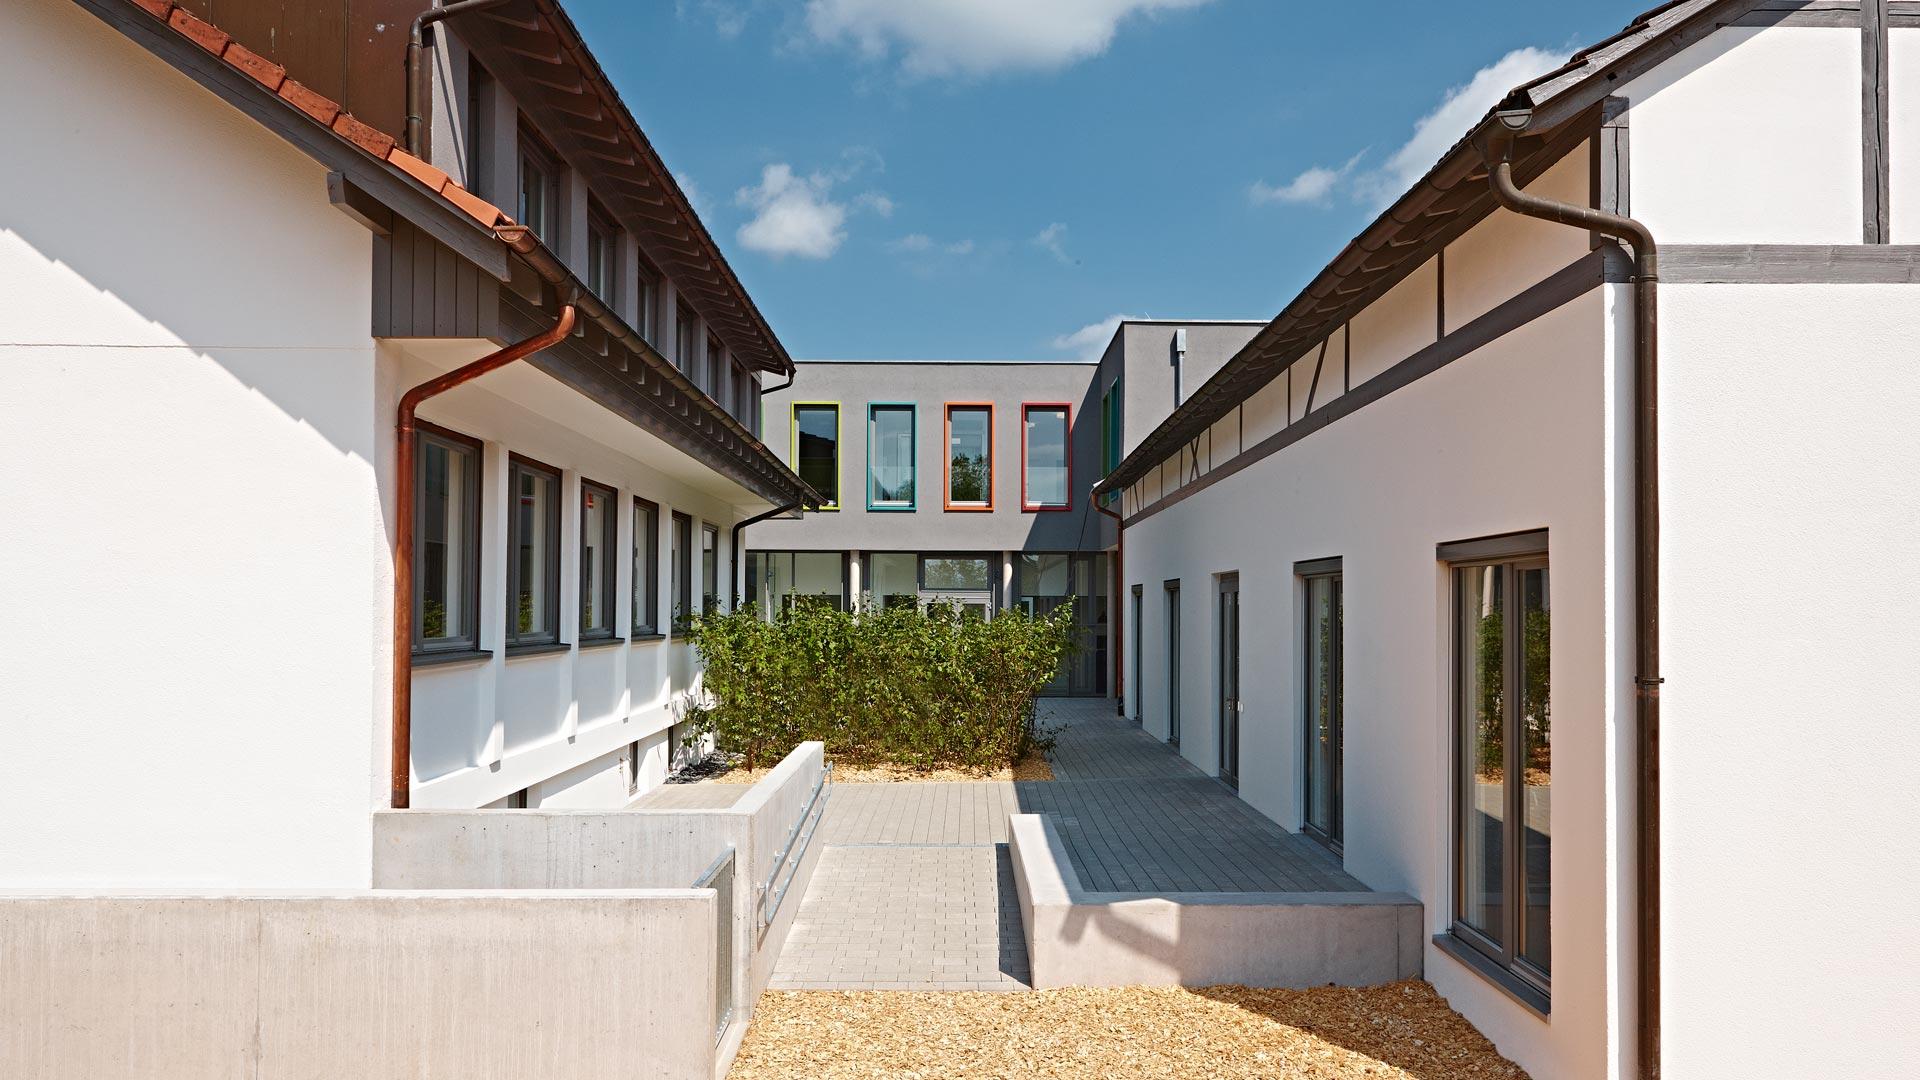 Kinderhaus St. Marien